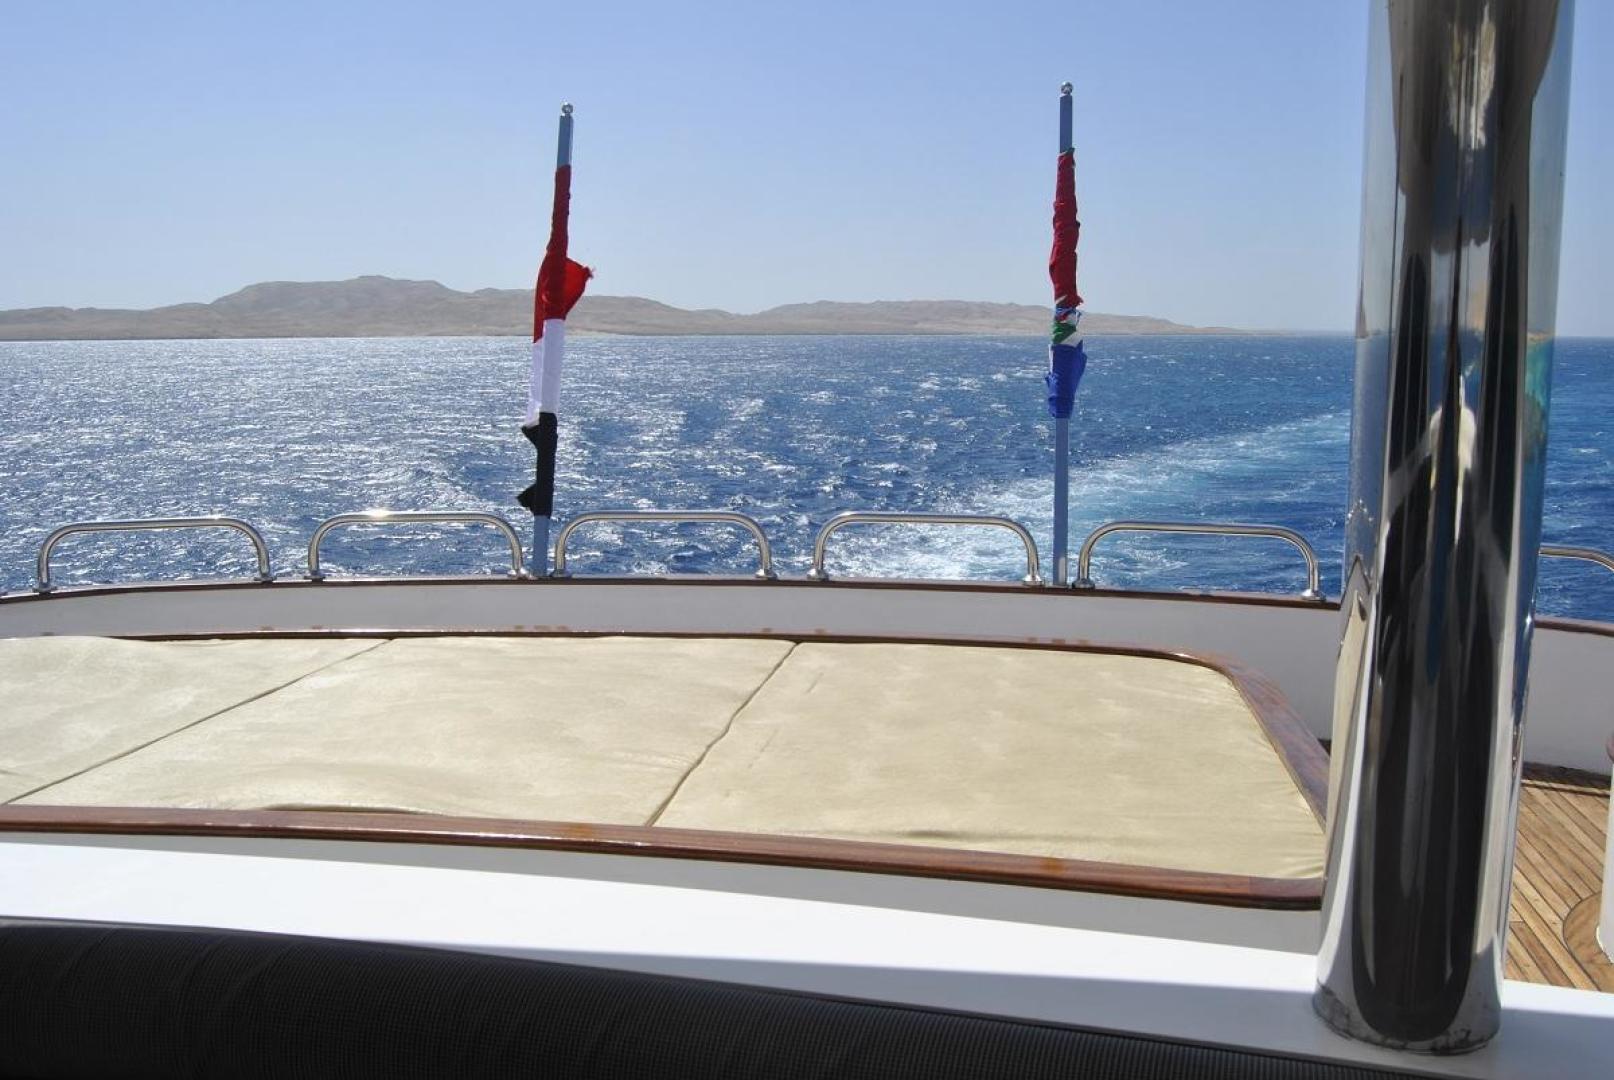 Custom-Oceando 143 2010 -Egypt-1173947 | Thumbnail